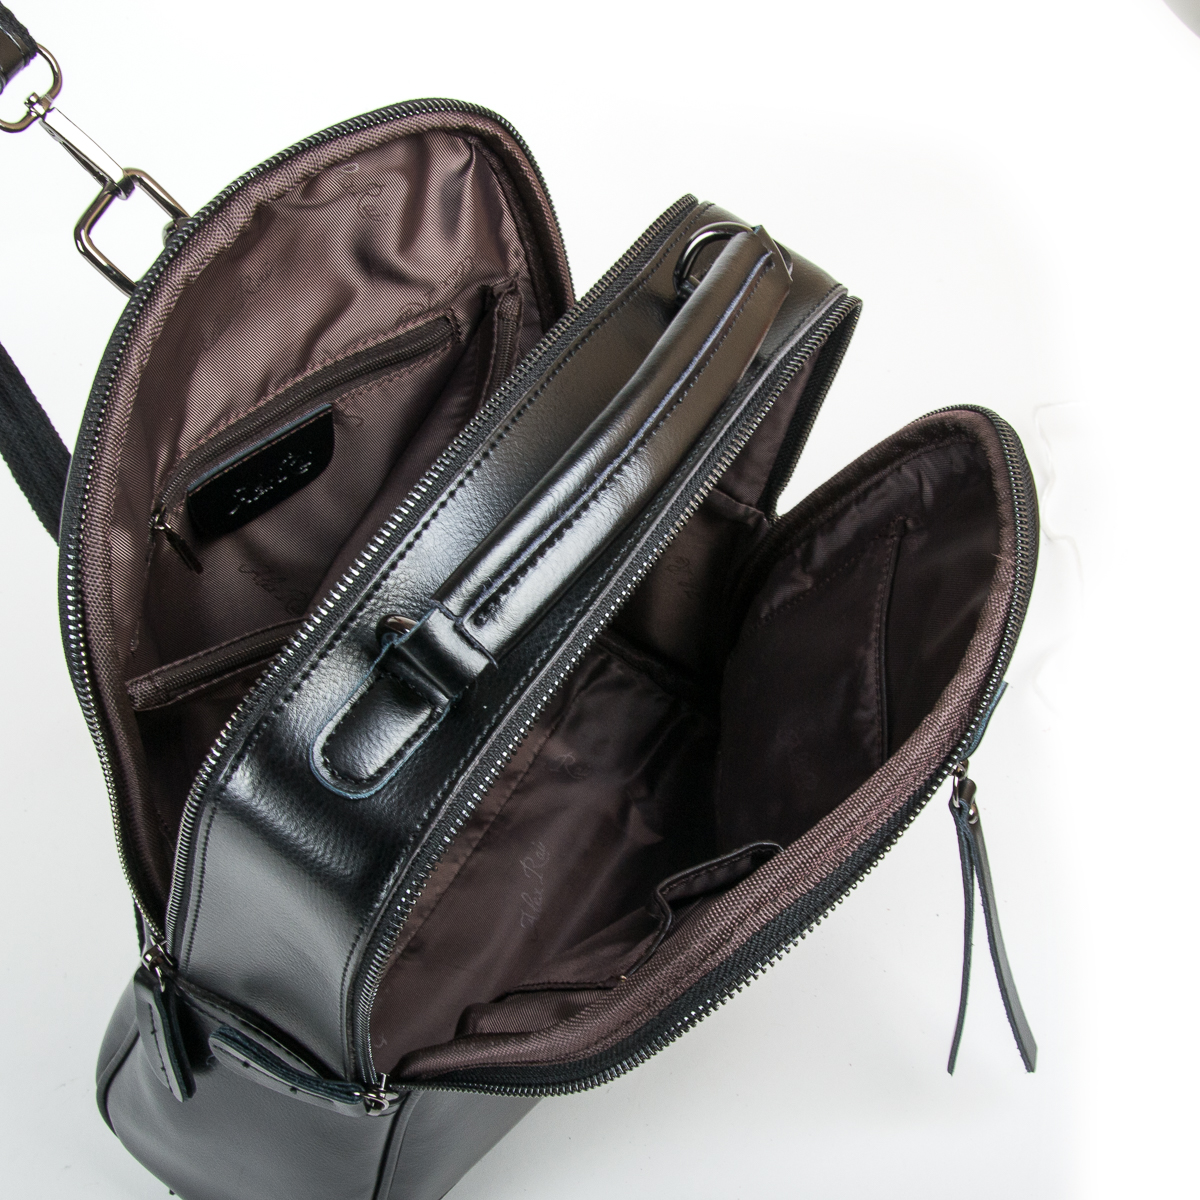 Сумка Женская Рюкзак кожа ALEX RAI 9-01 8694-3 black - фото 5